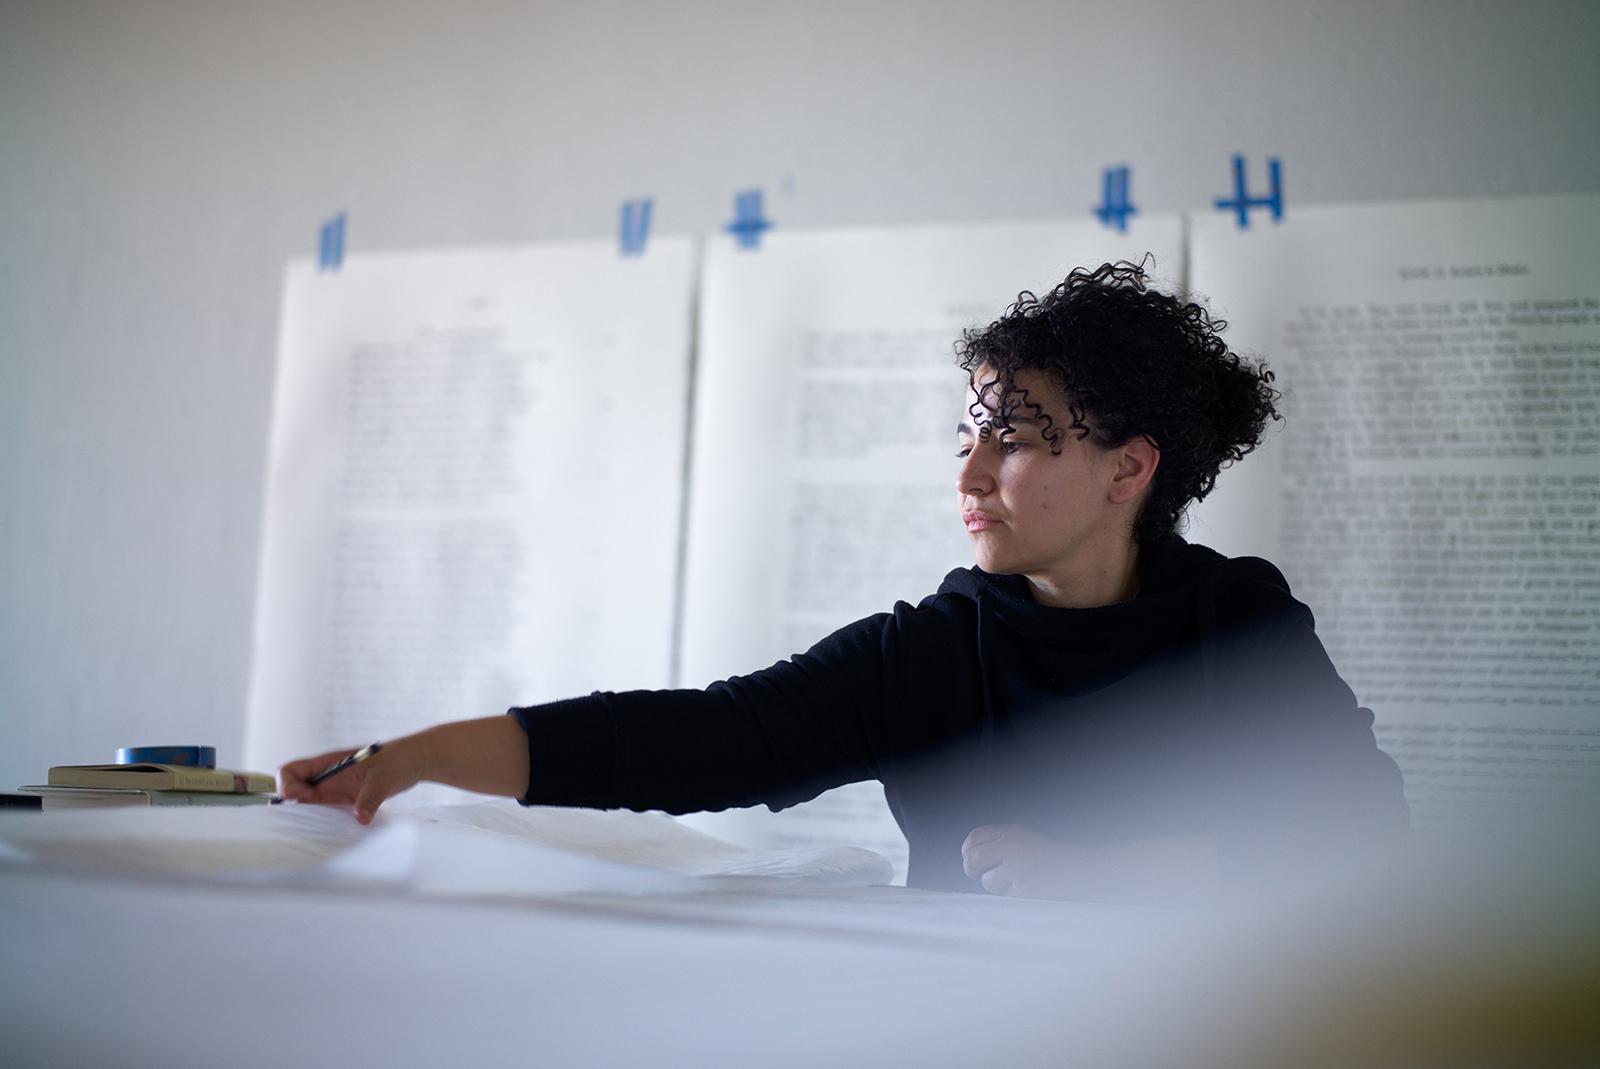 Artist Bethany Collins working in her studio